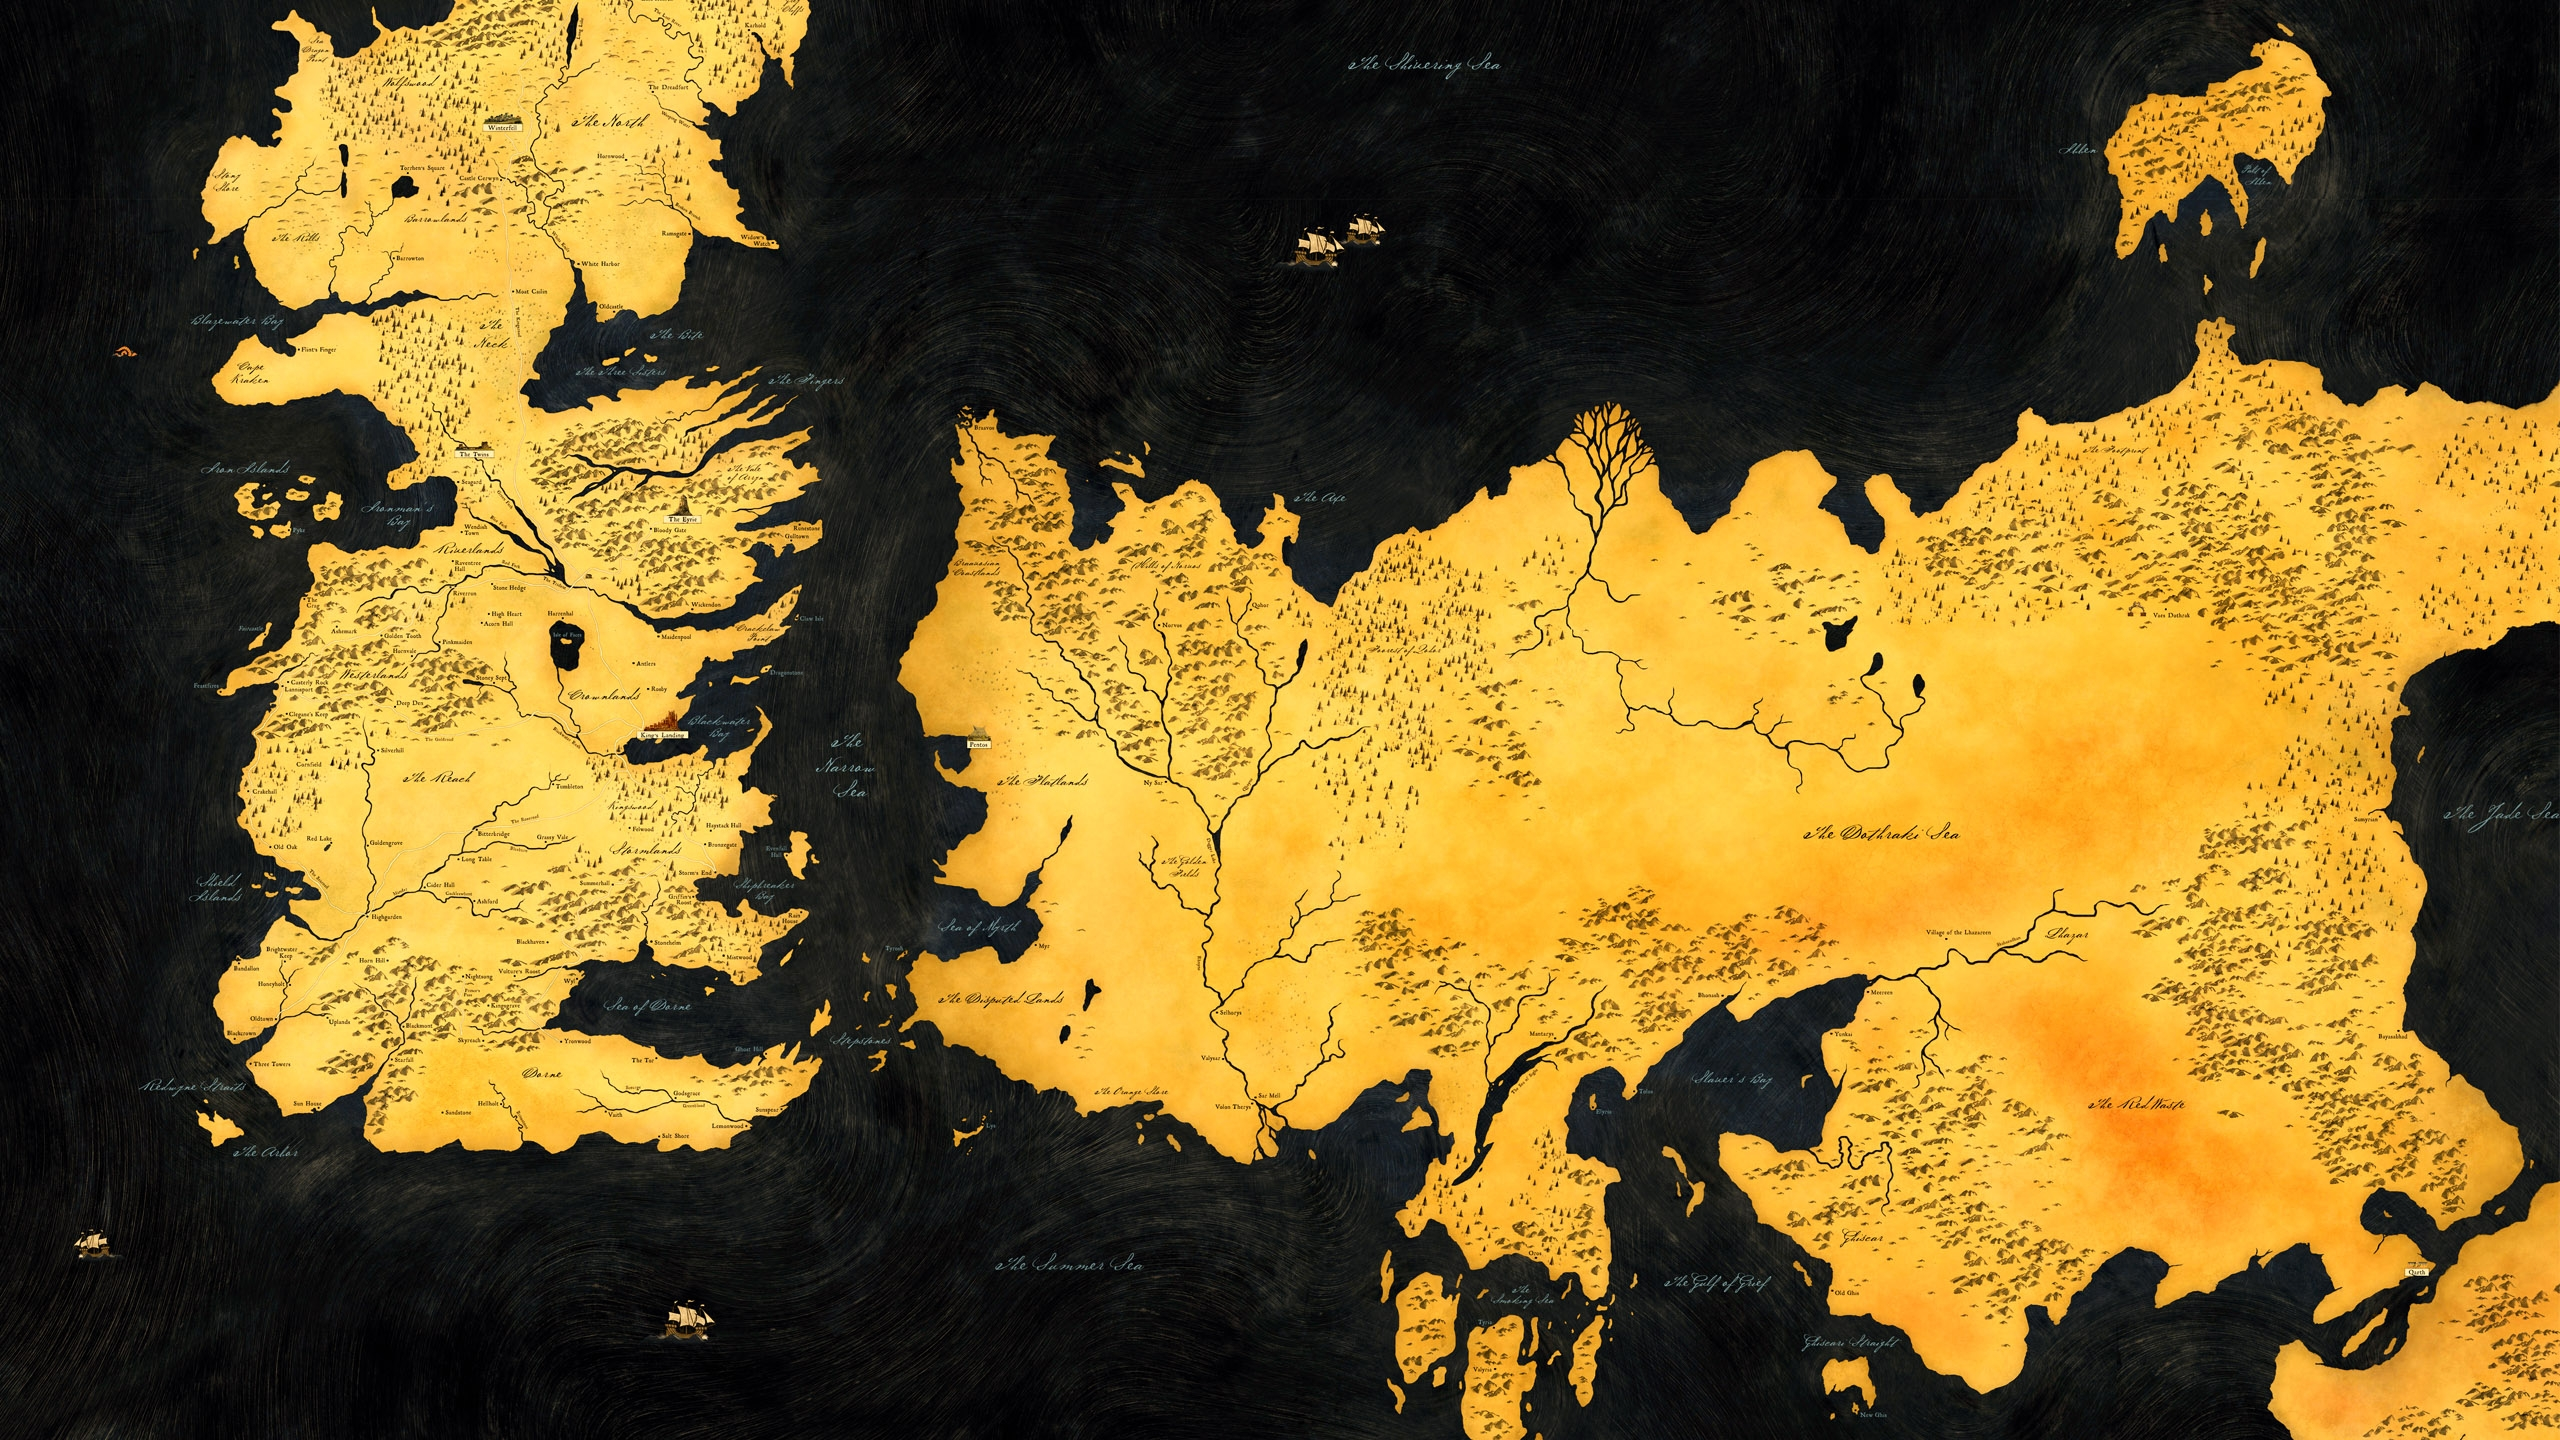 Game Of Thrones Map Hd Wallpaper   Facebook Cover   PoPoPicscom 2560x1440